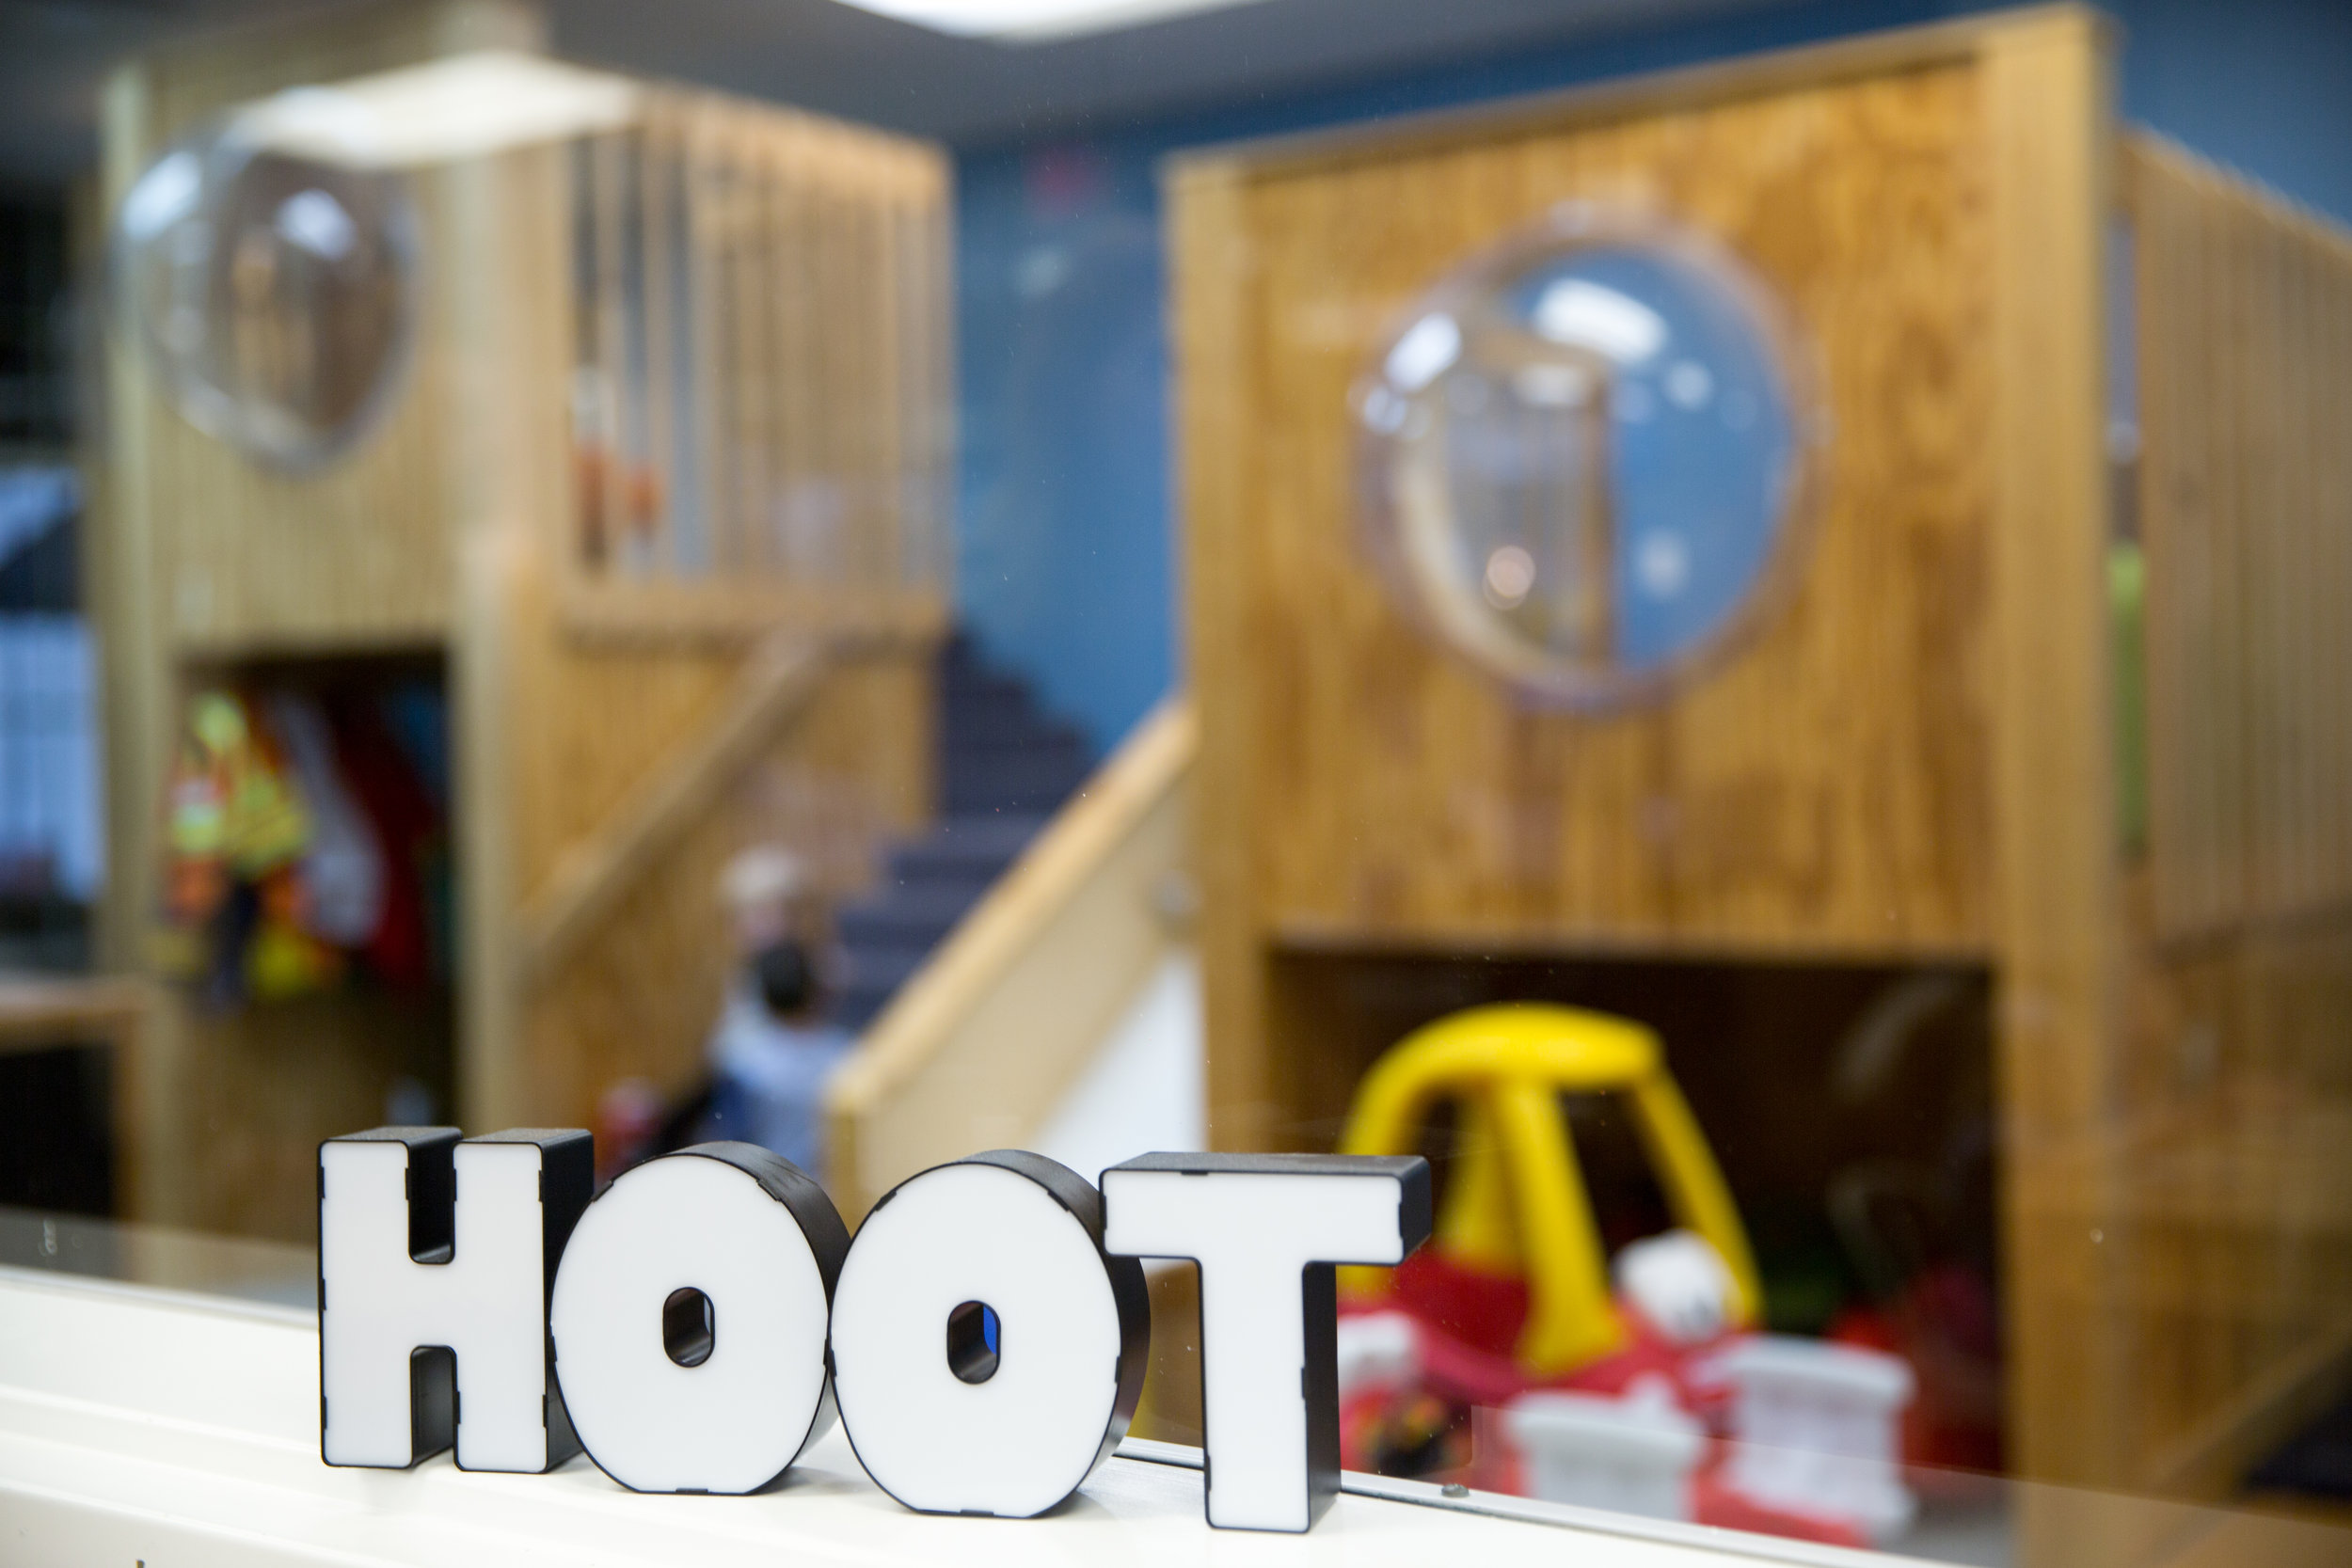 Hoot_Studio_Play_Cafe_HOOT_Interior.jpg